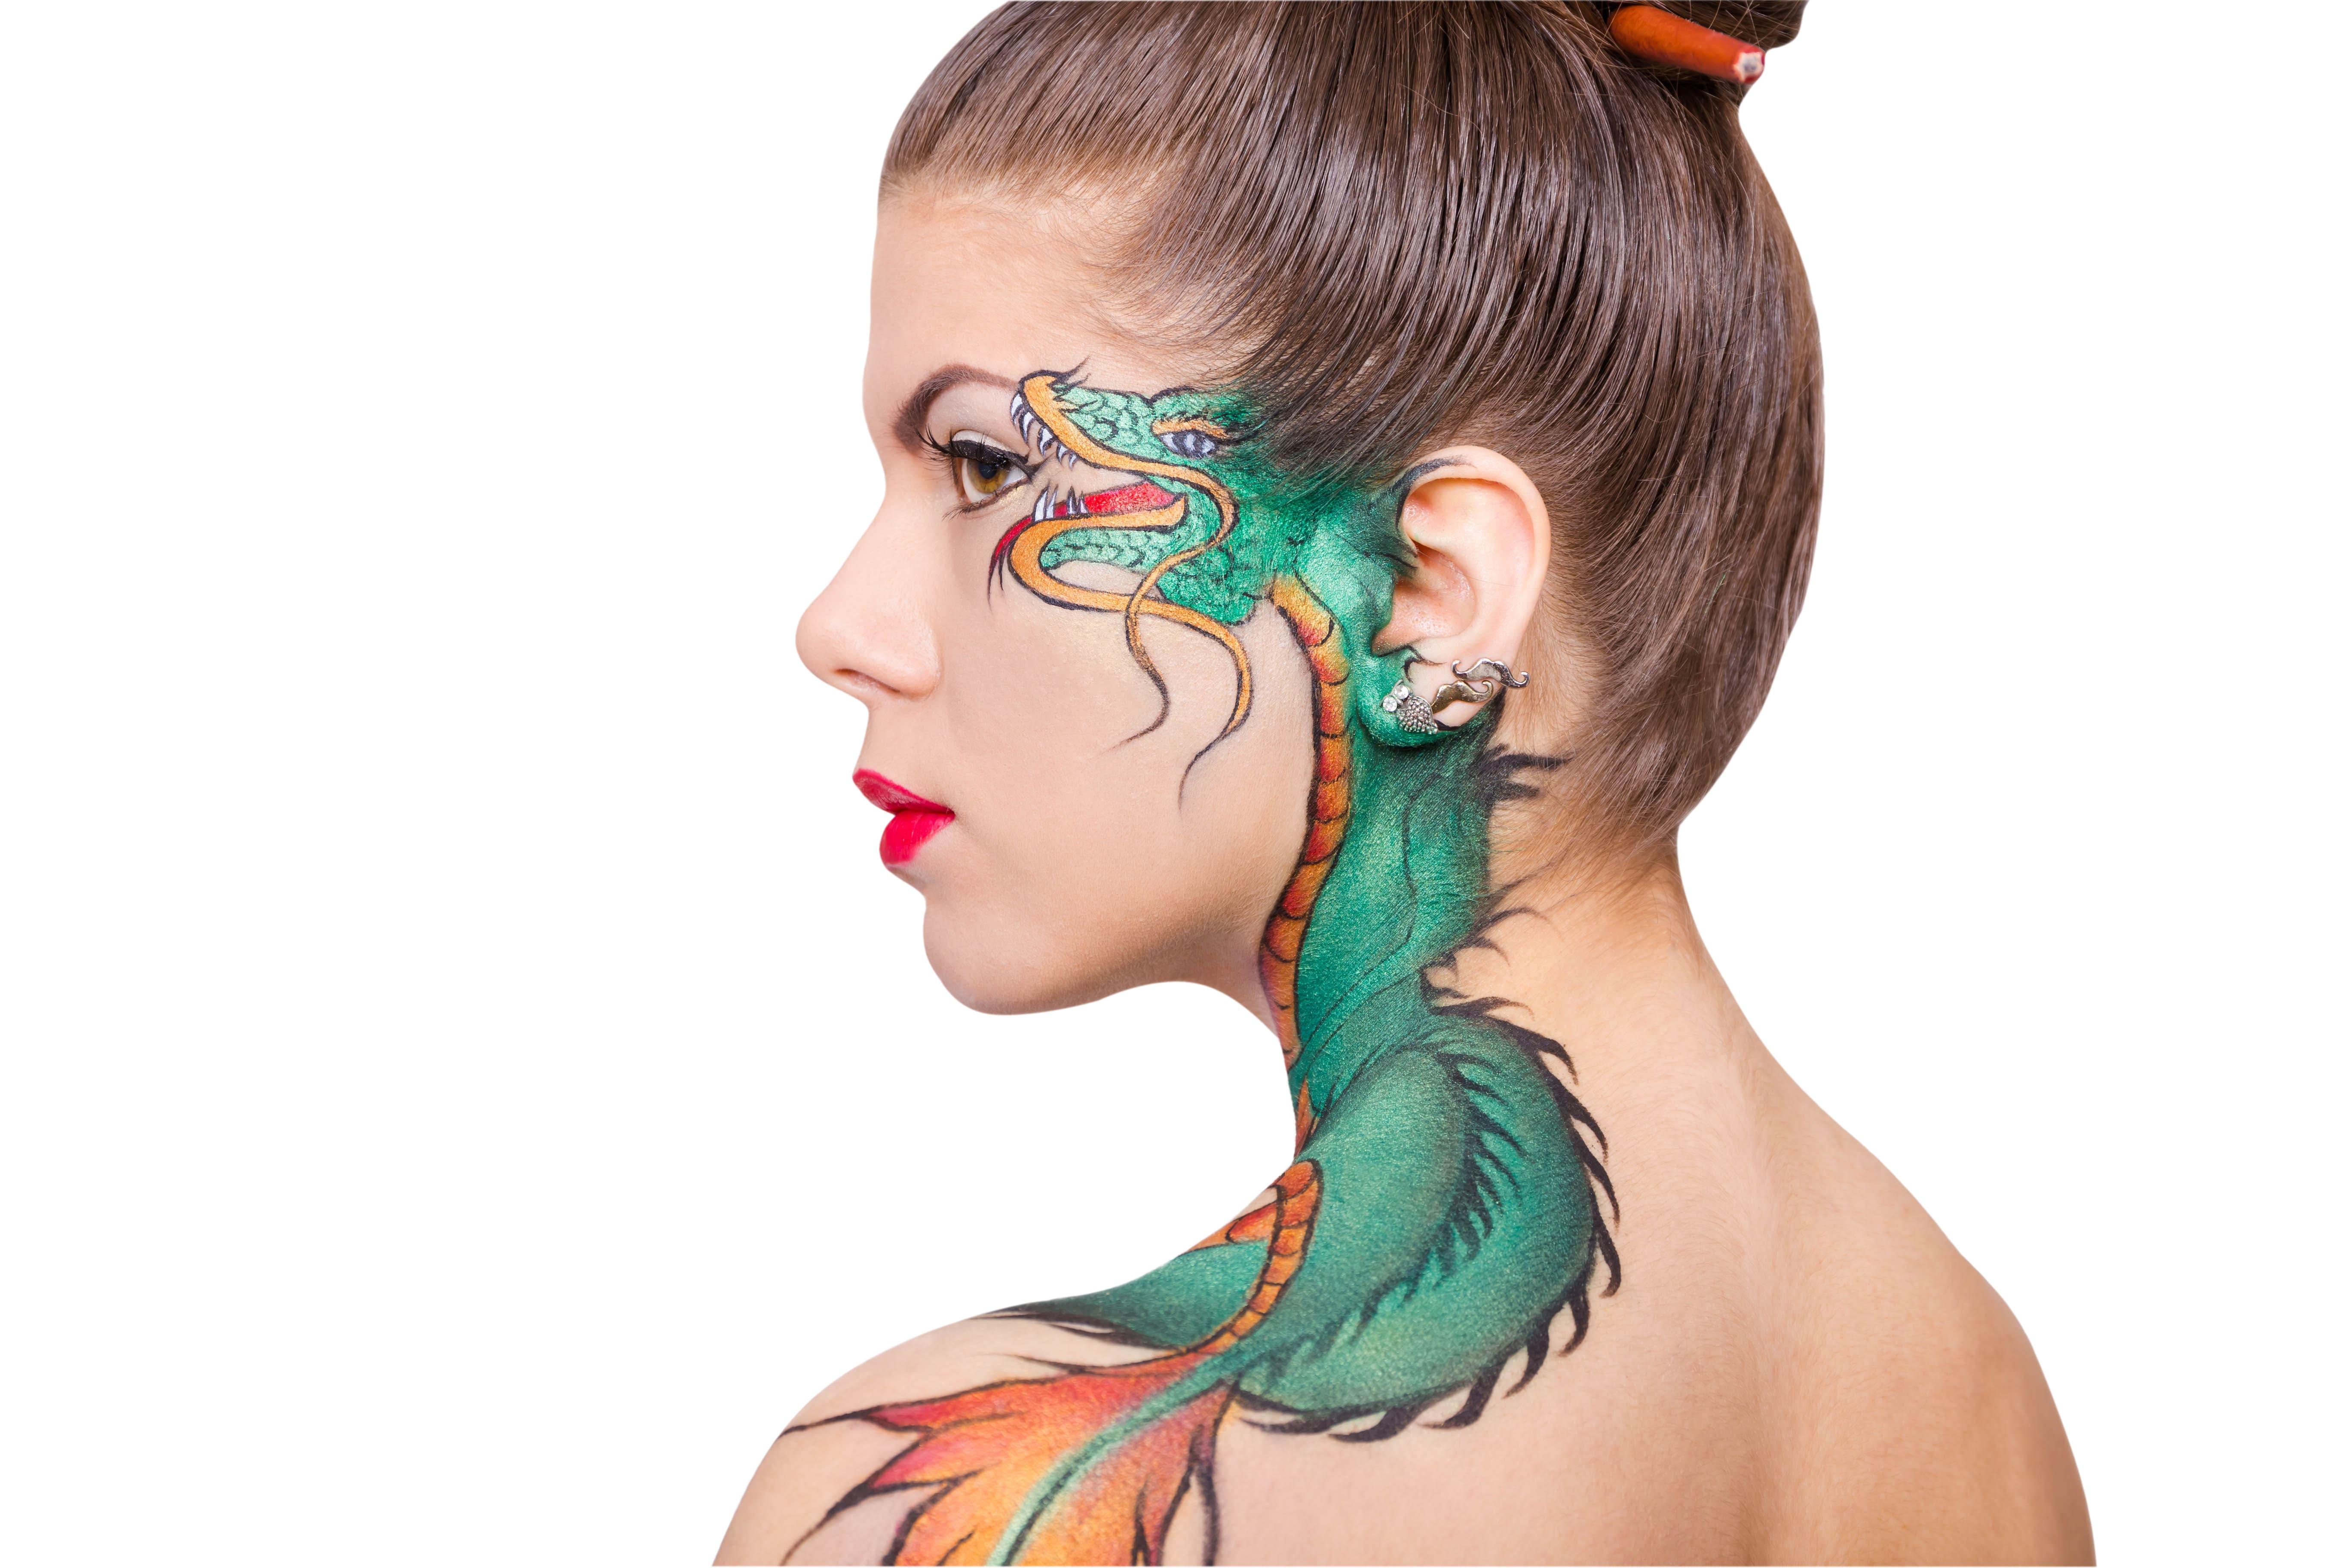 Tattoo Design Ideas for Girls - 19